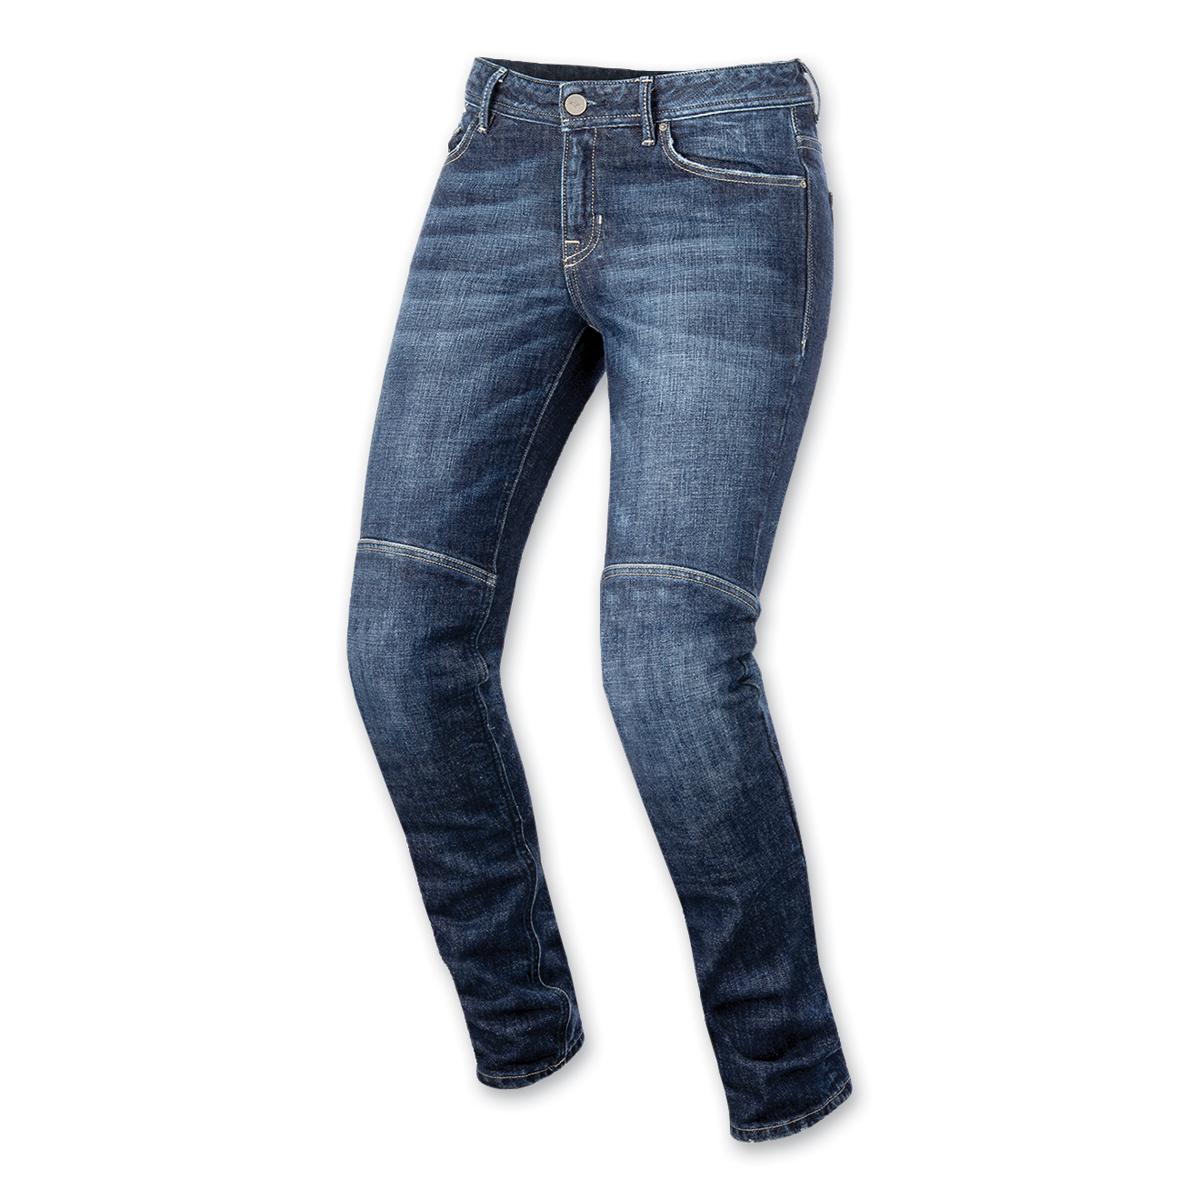 Alpinestars Women's Daisy Dark Rinse Denim Jeans